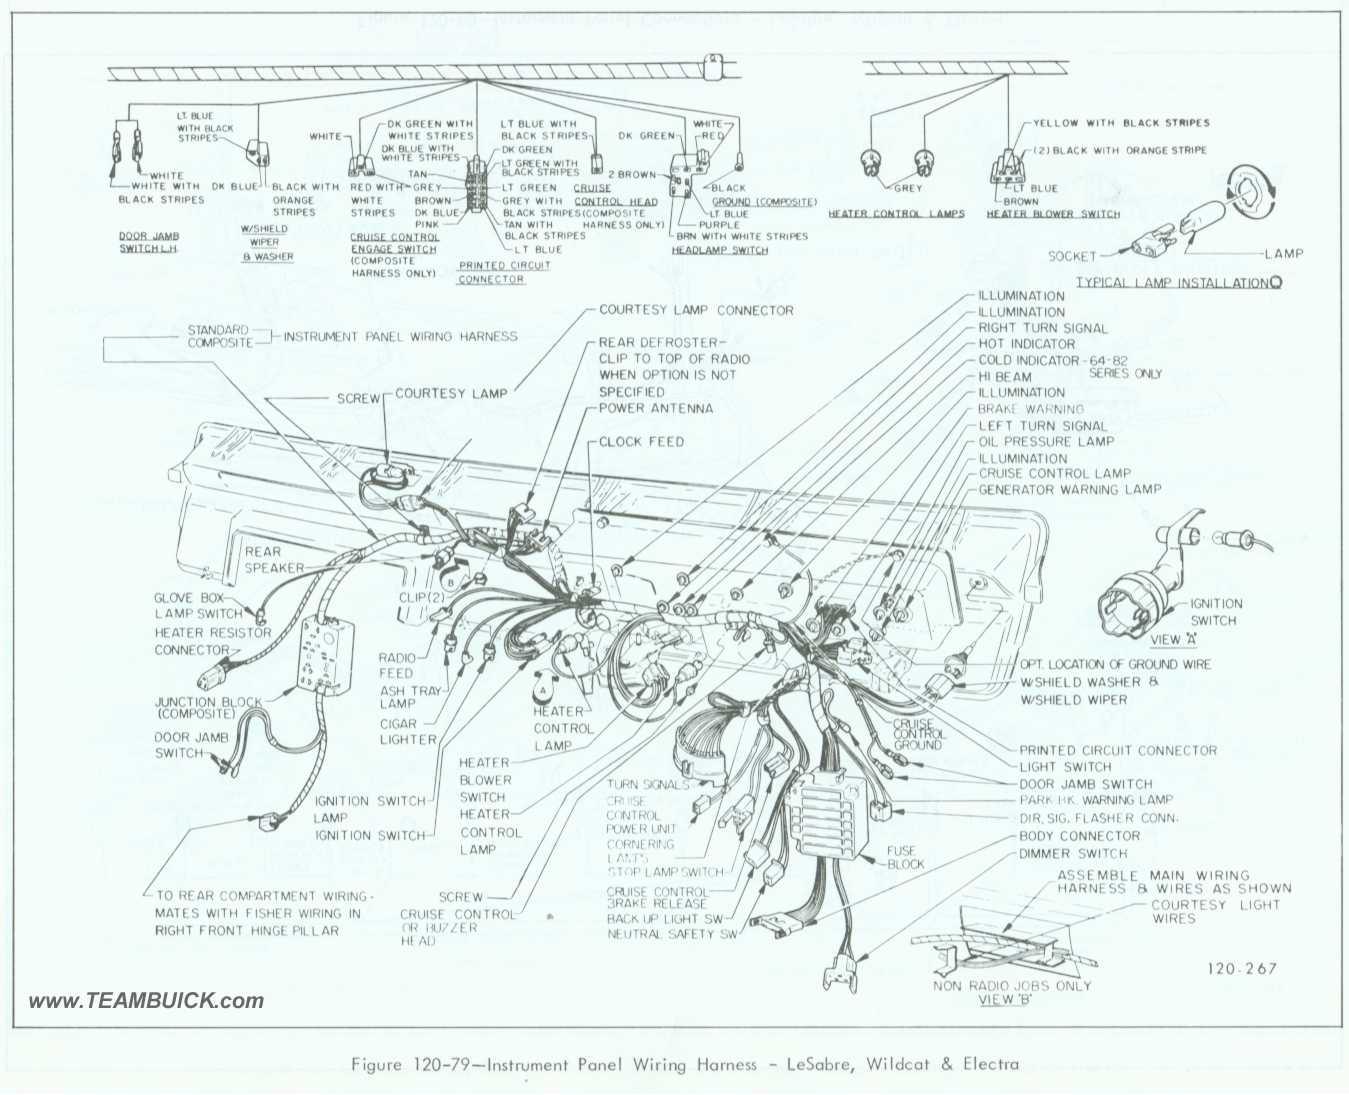 1967 Buick Wildcat Wiring Diagram 2000 Buick Wiring